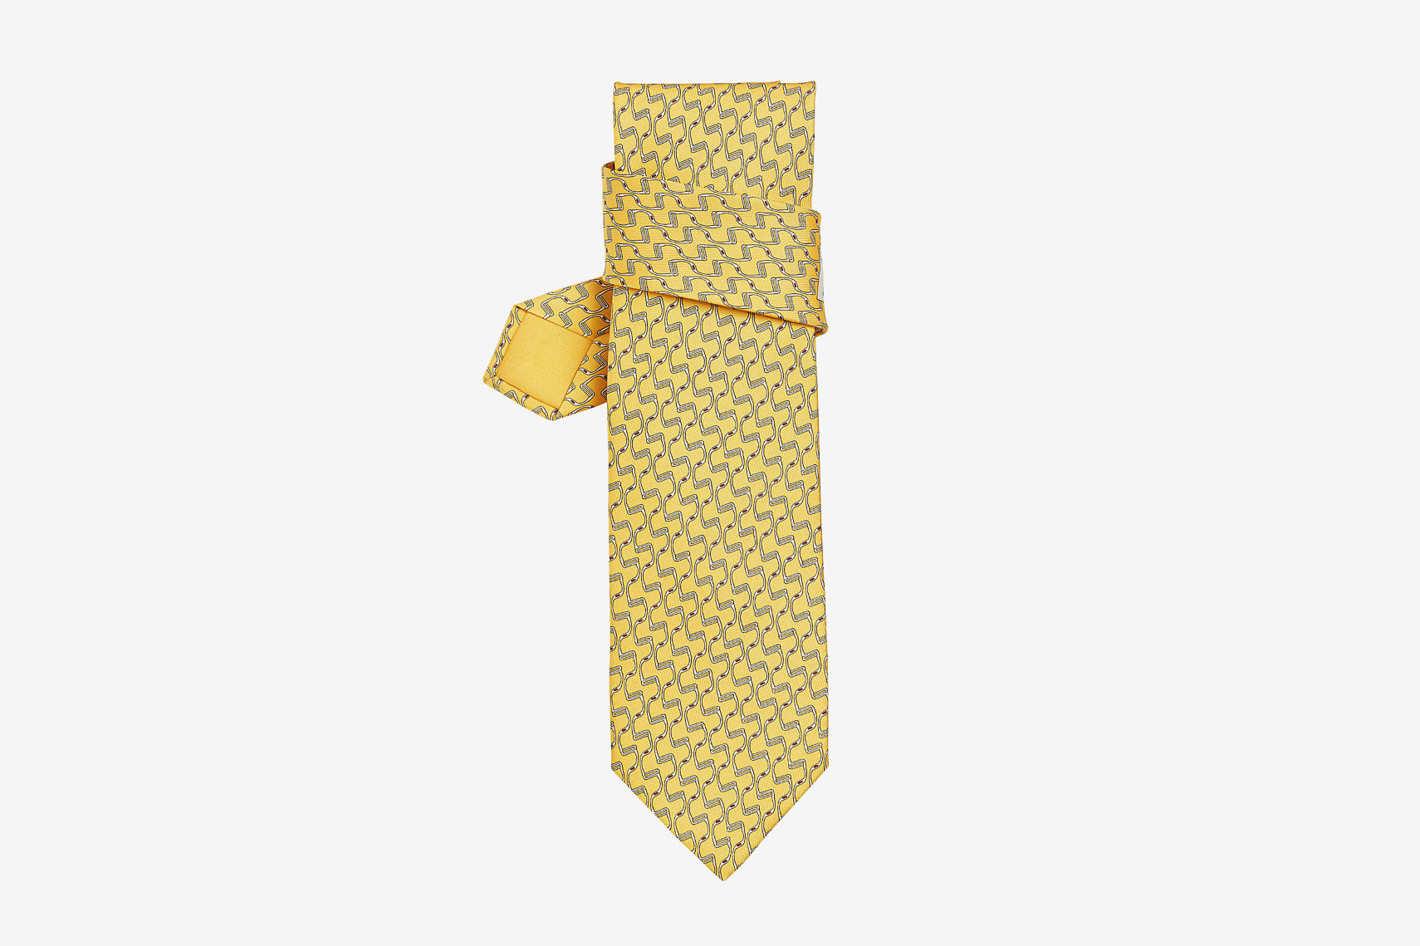 Meta Etrier Tie